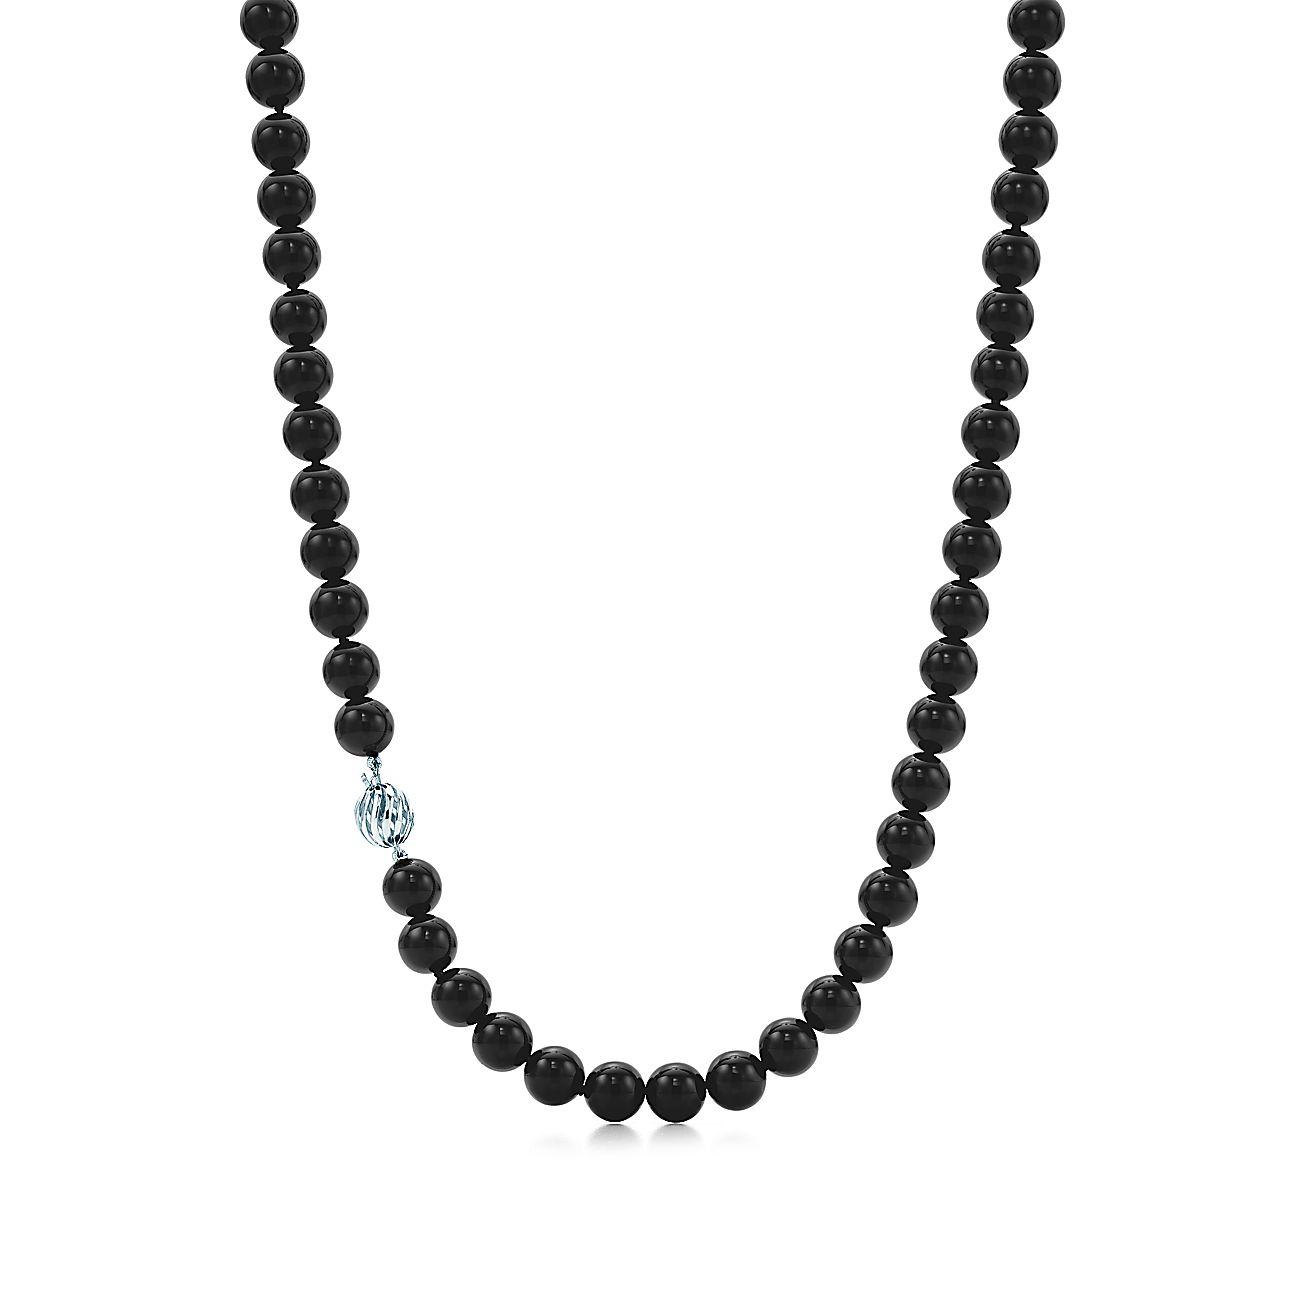 Ziegfeld Collection:Black Onyx Necklace